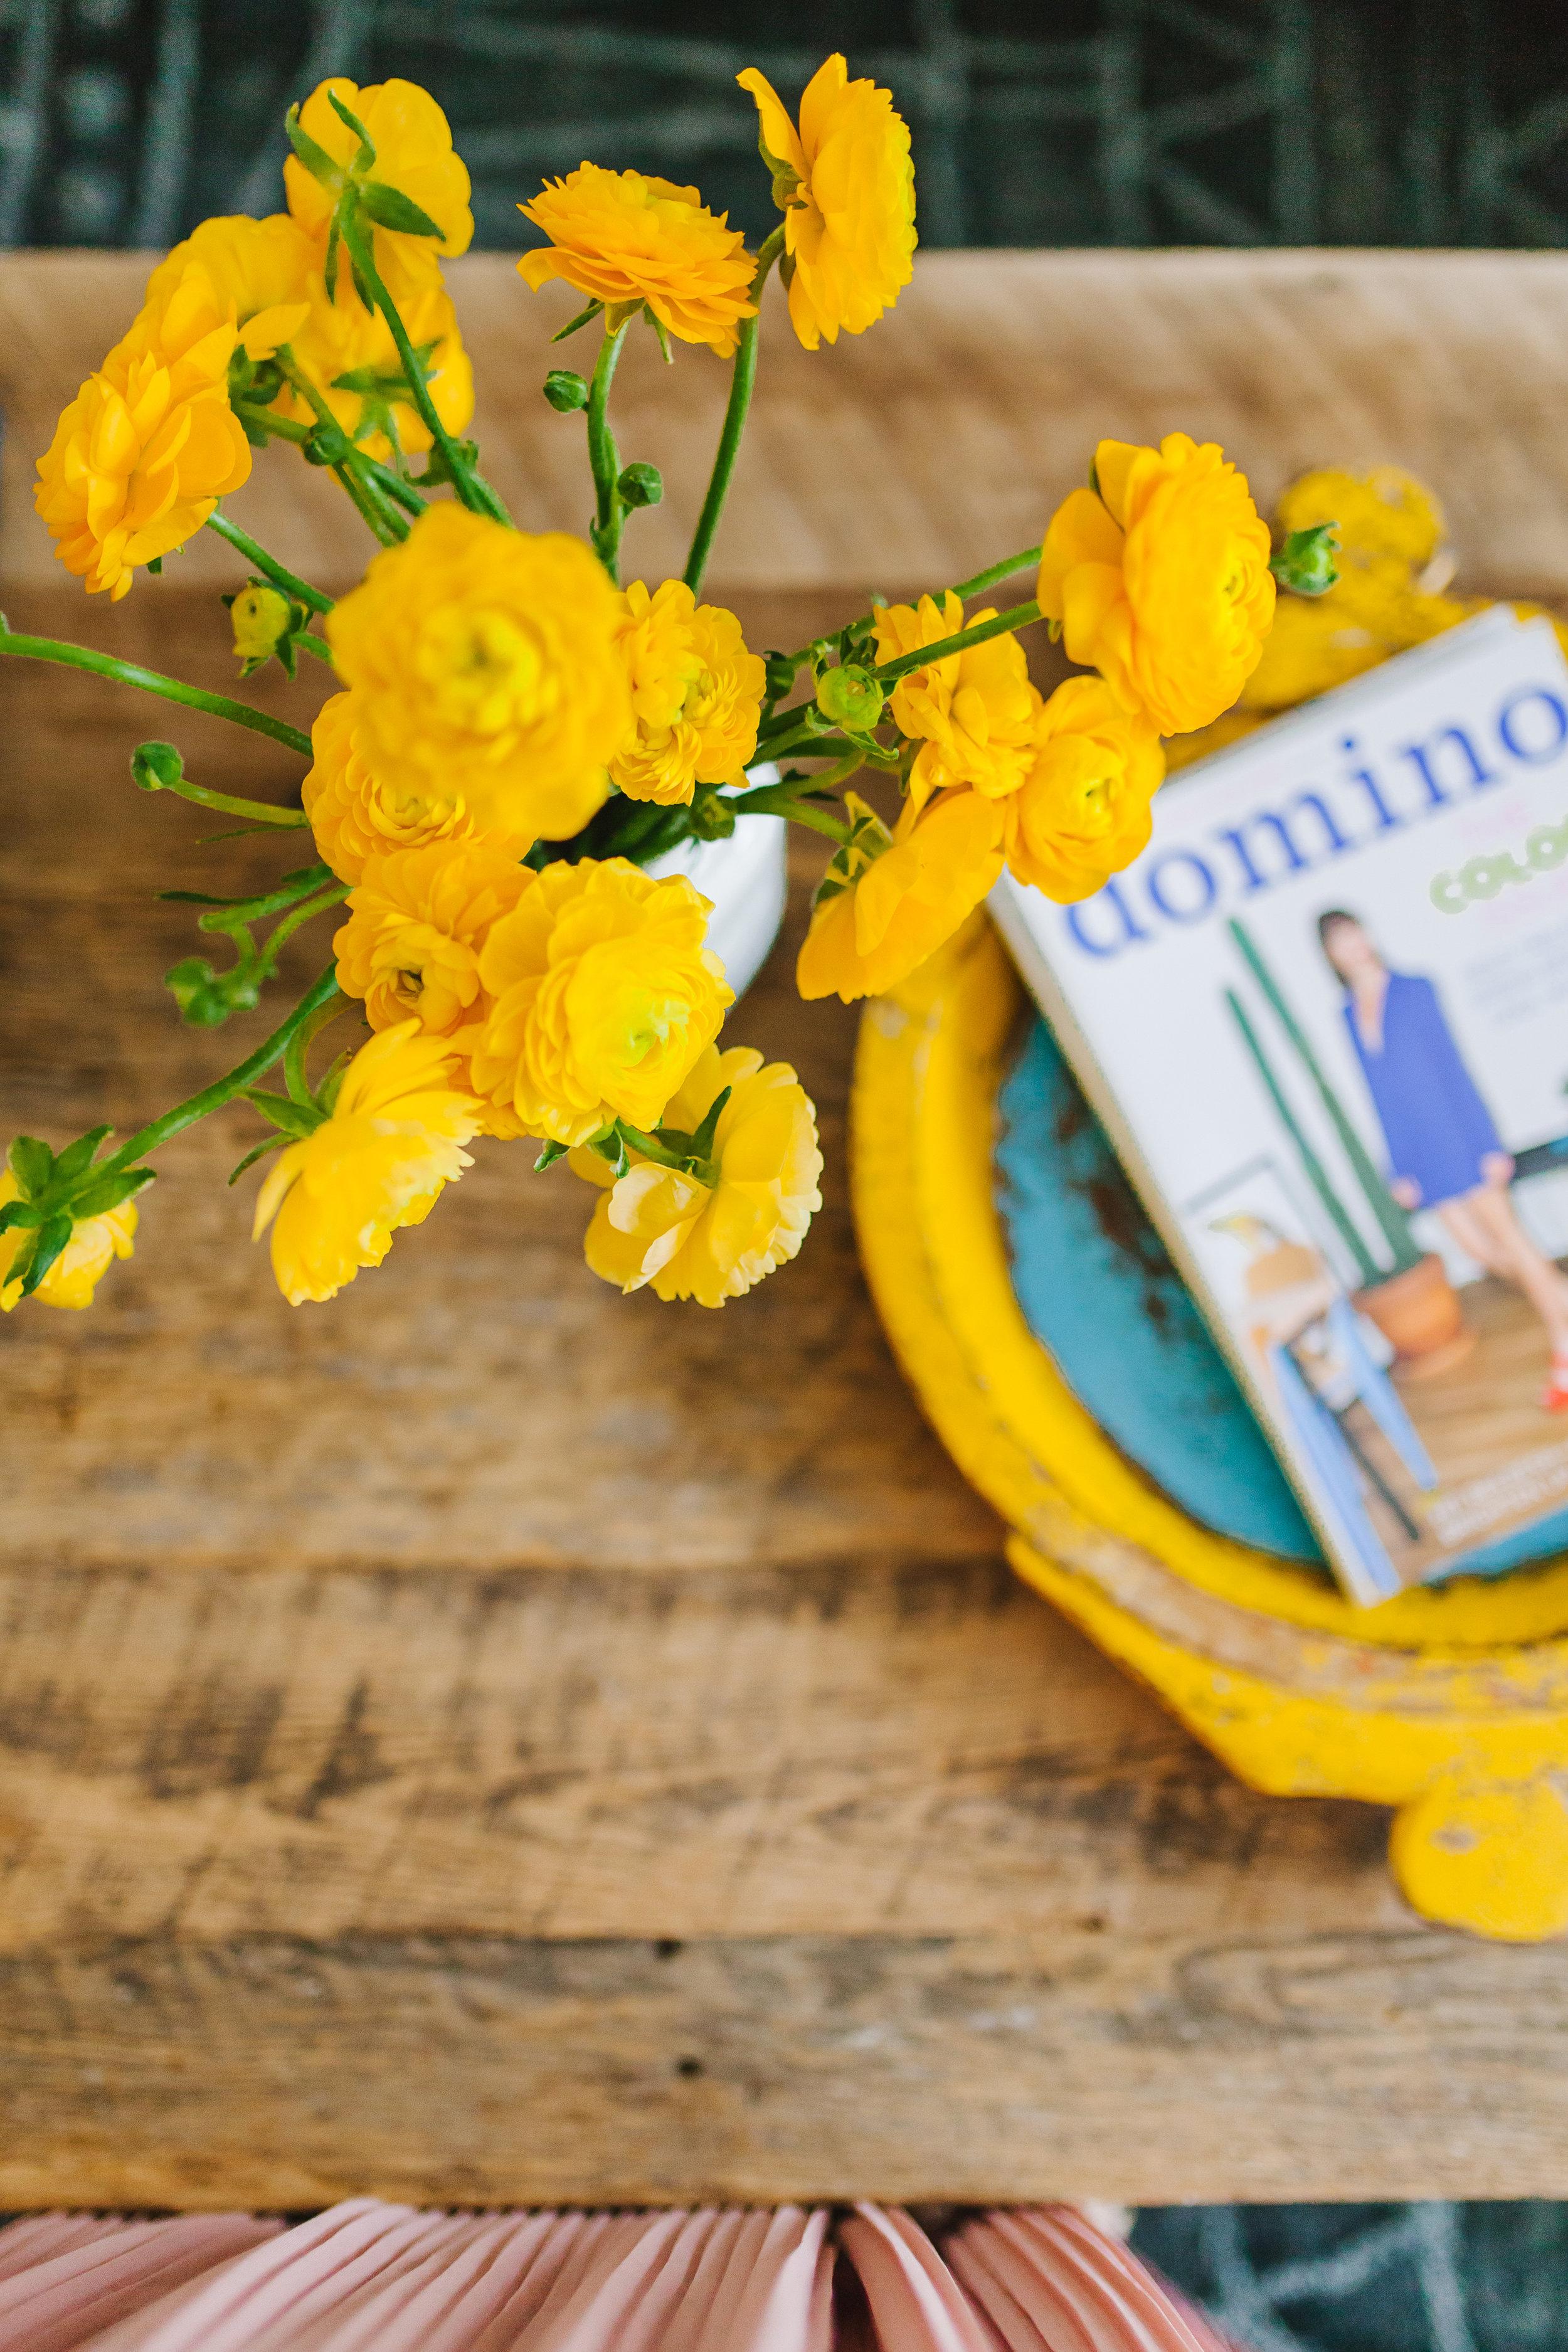 Yellow Peonies at Yellow Bungalow Interior Design Studio